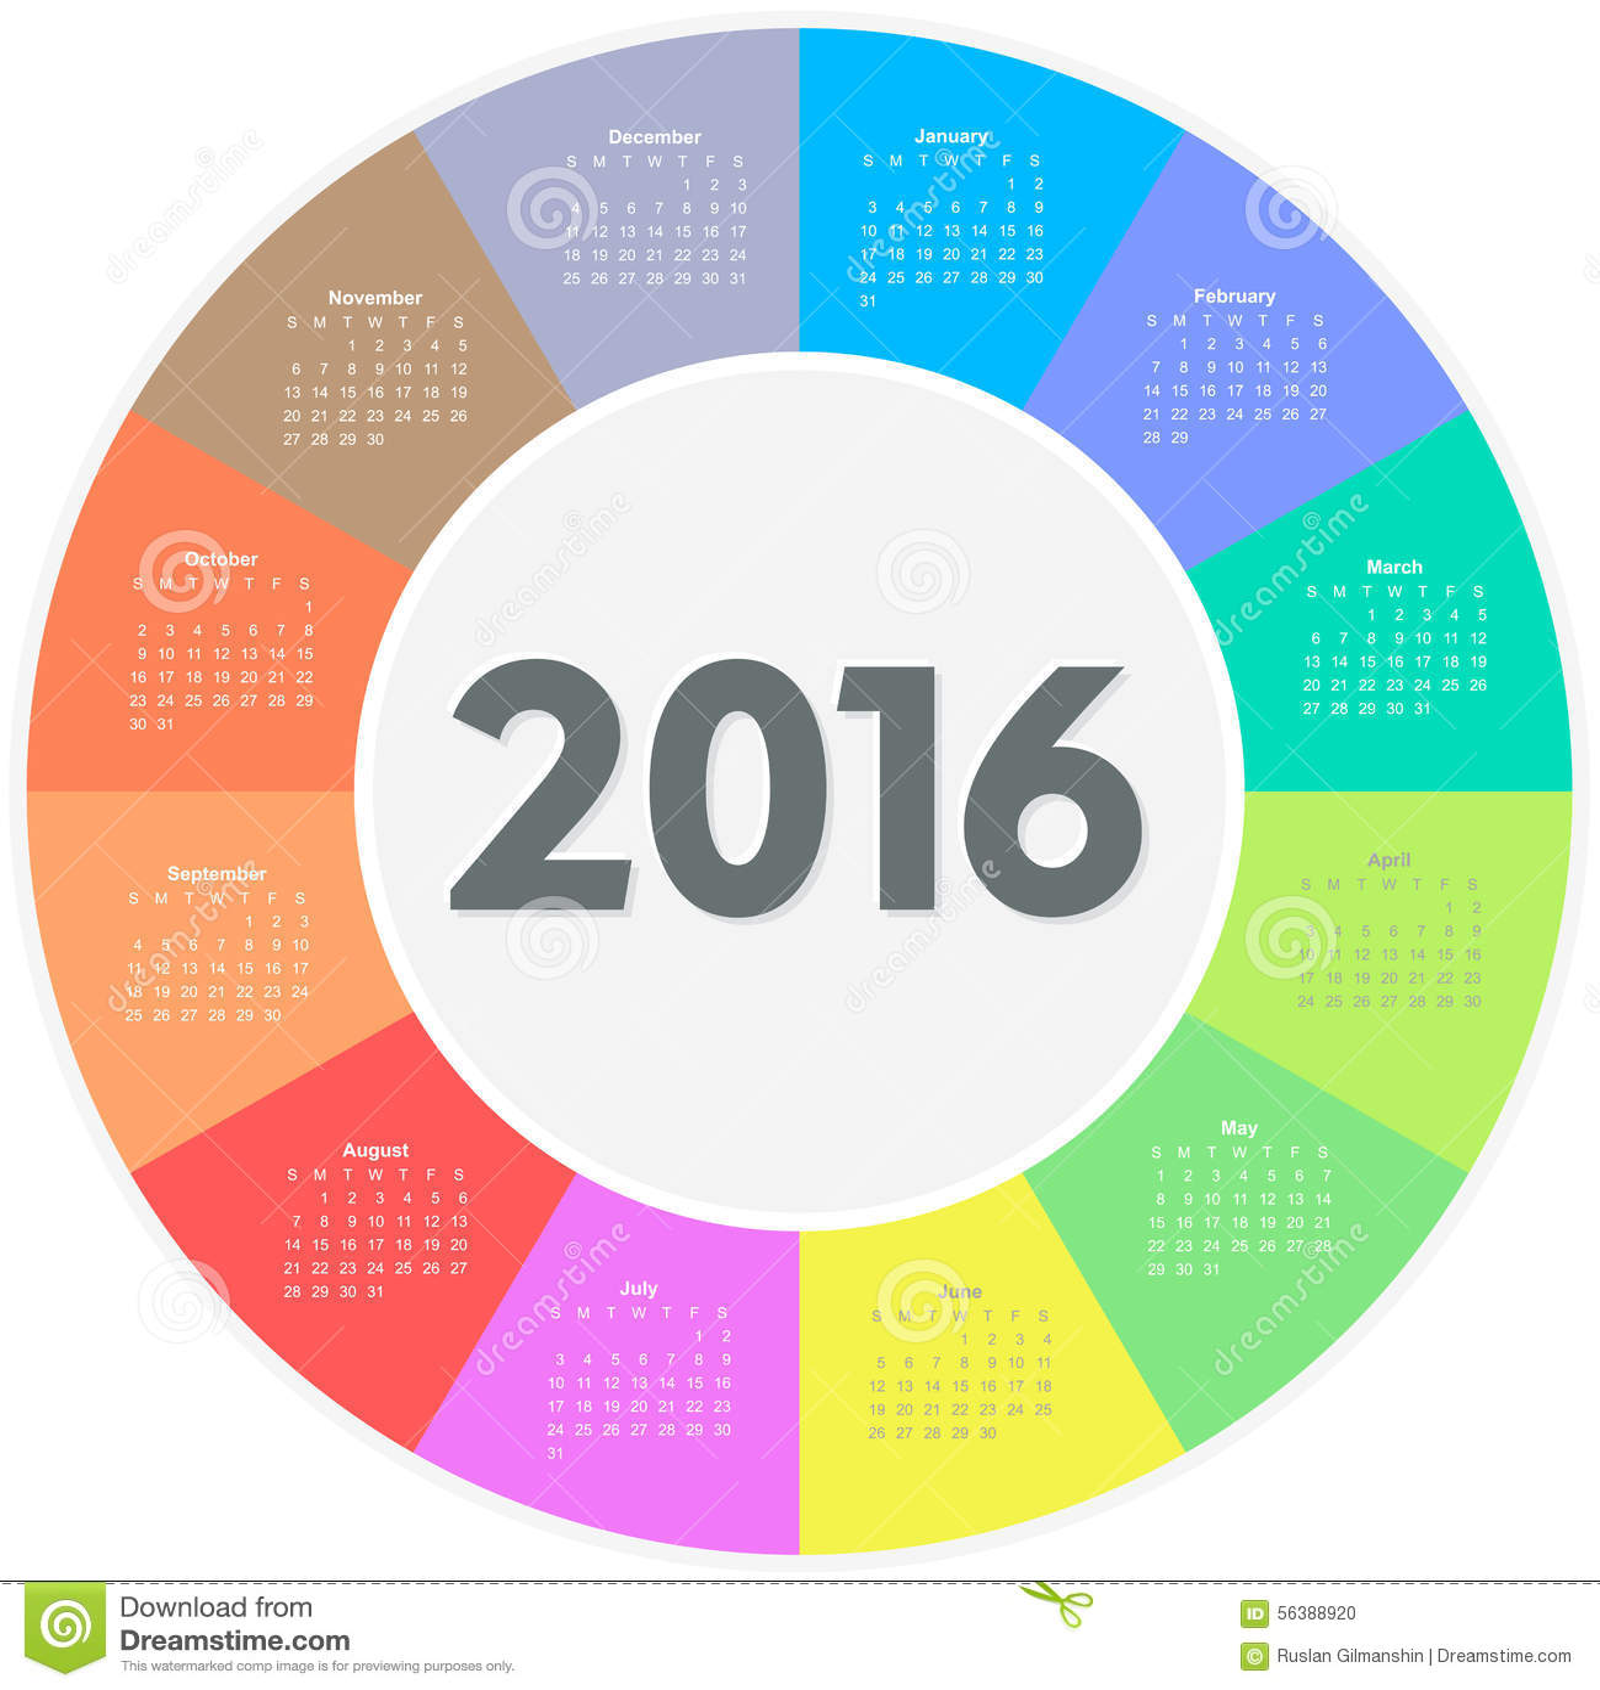 Circle Calendar For 2016 Year Stock Vector Image 56388920